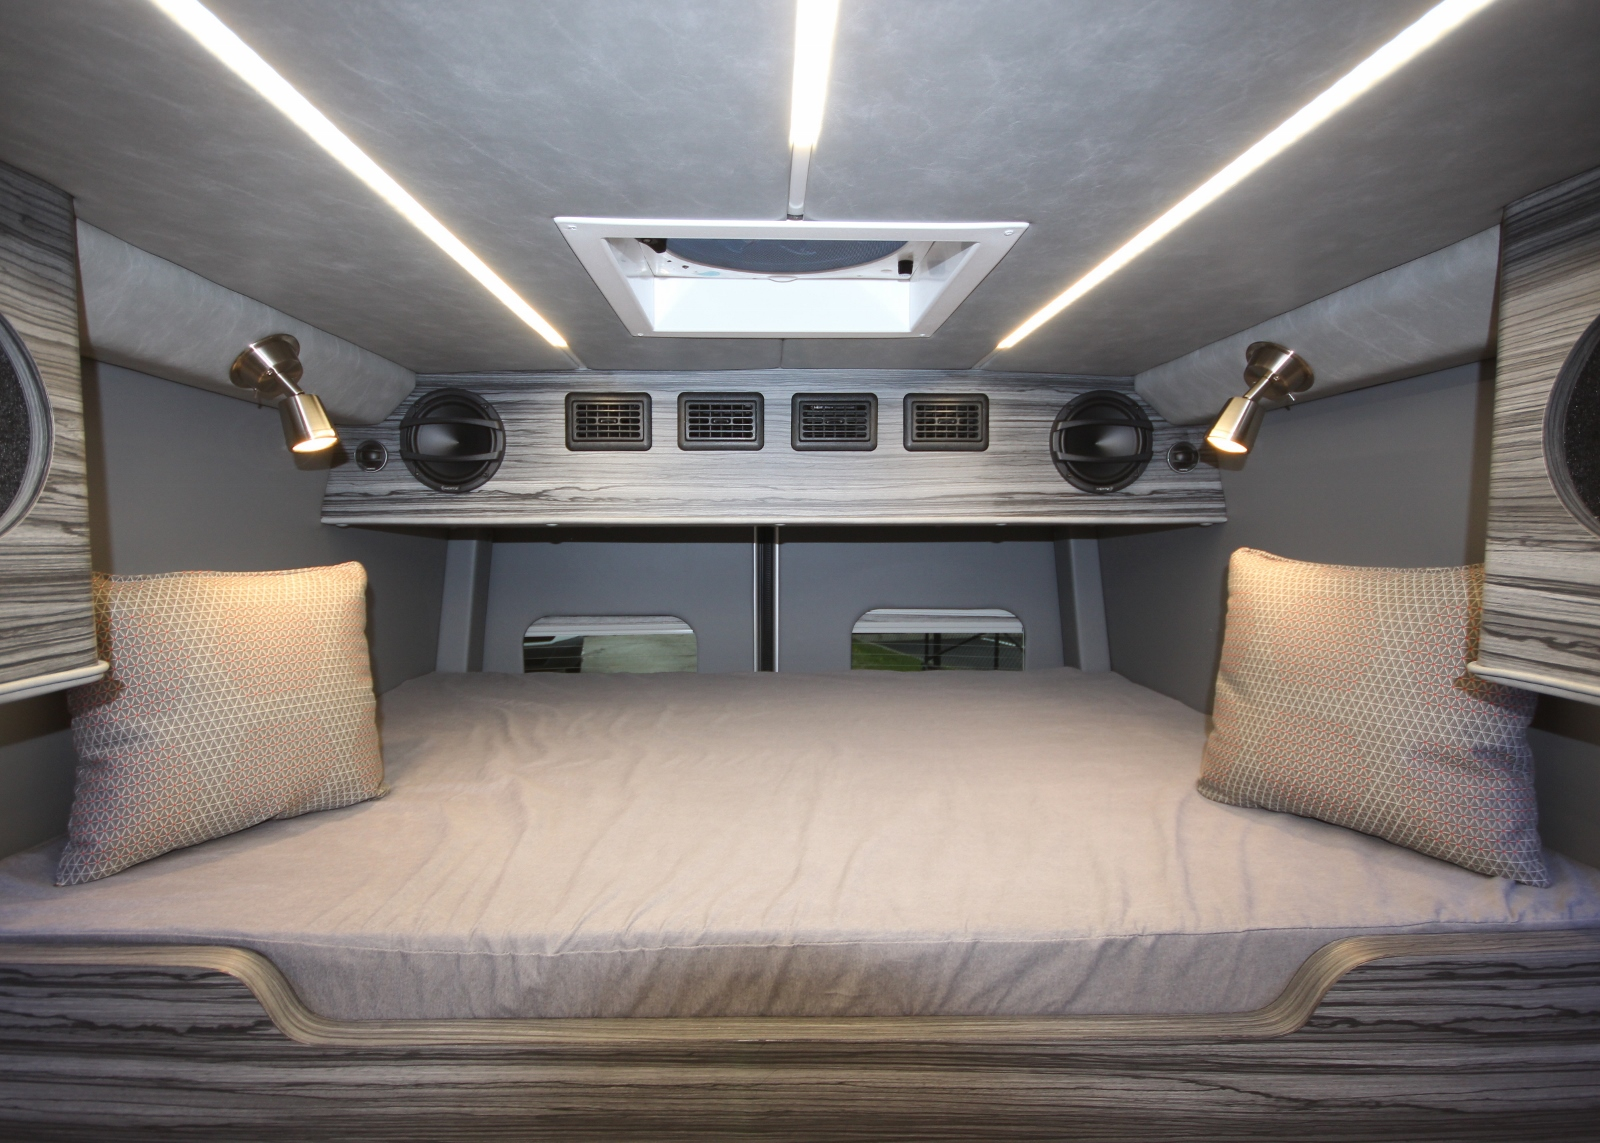 Fully Loaded Off Road Sprinter Van